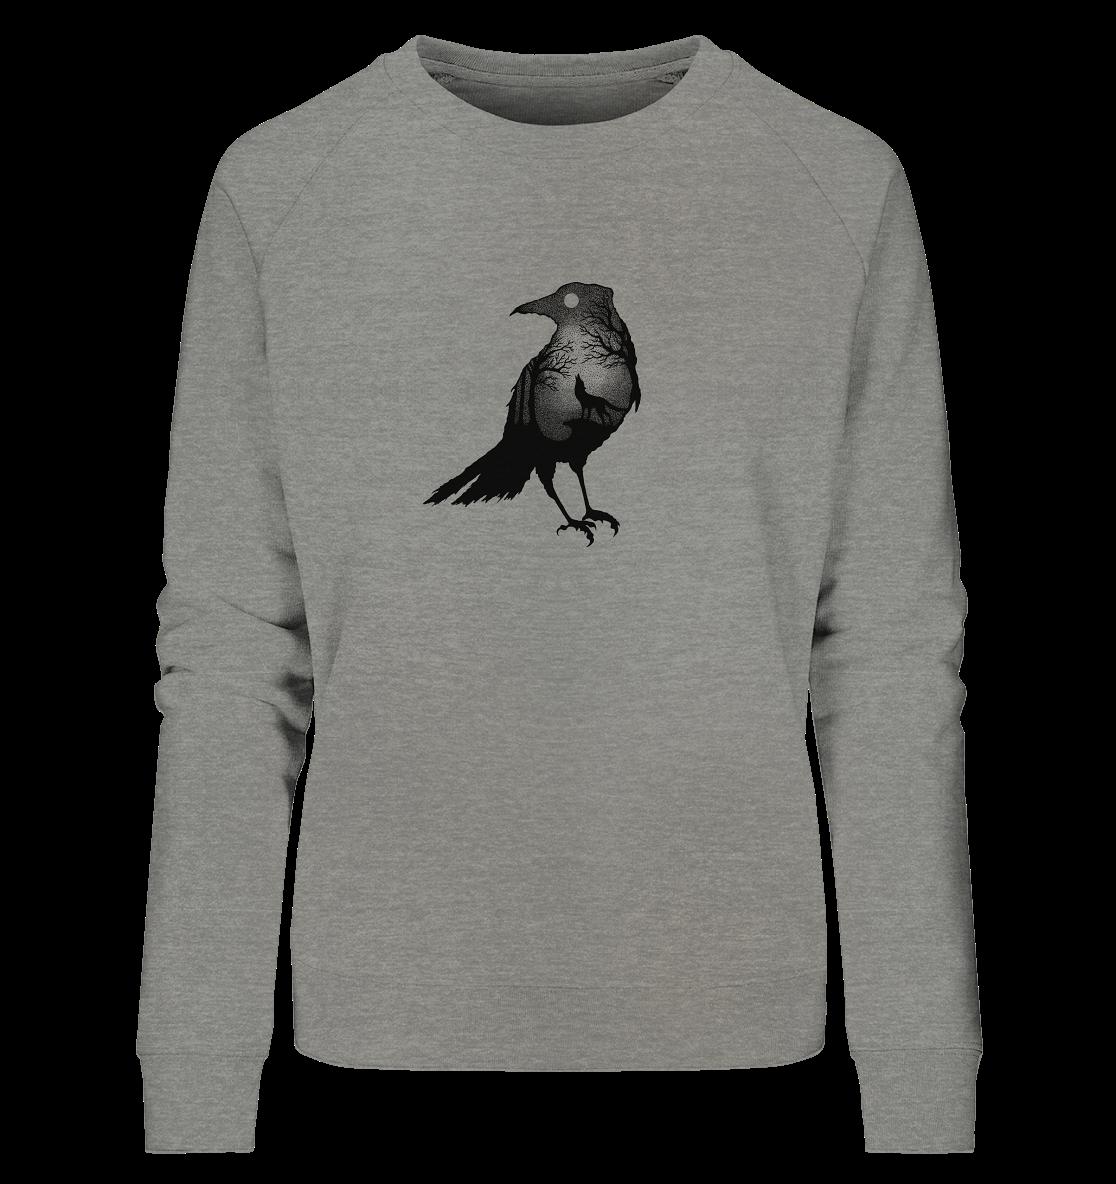 front-ladies-organic-sweatshirt-818381-1116x-2.png